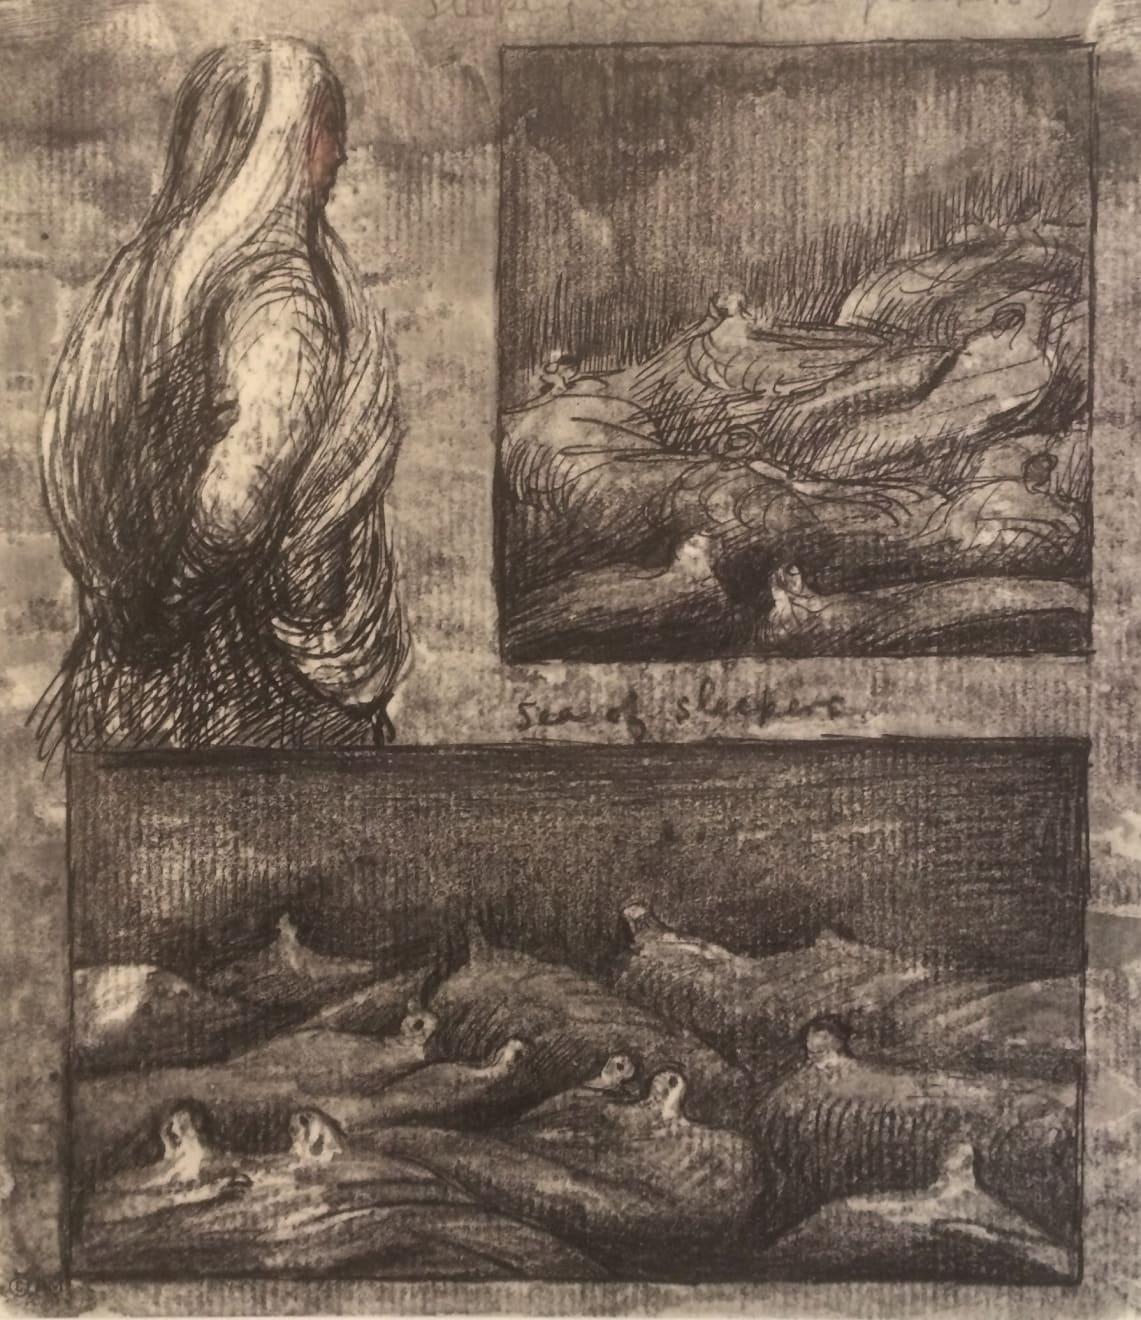 Henry Moore, Untitled XXXVI (Shelter Sketchbook), 1967